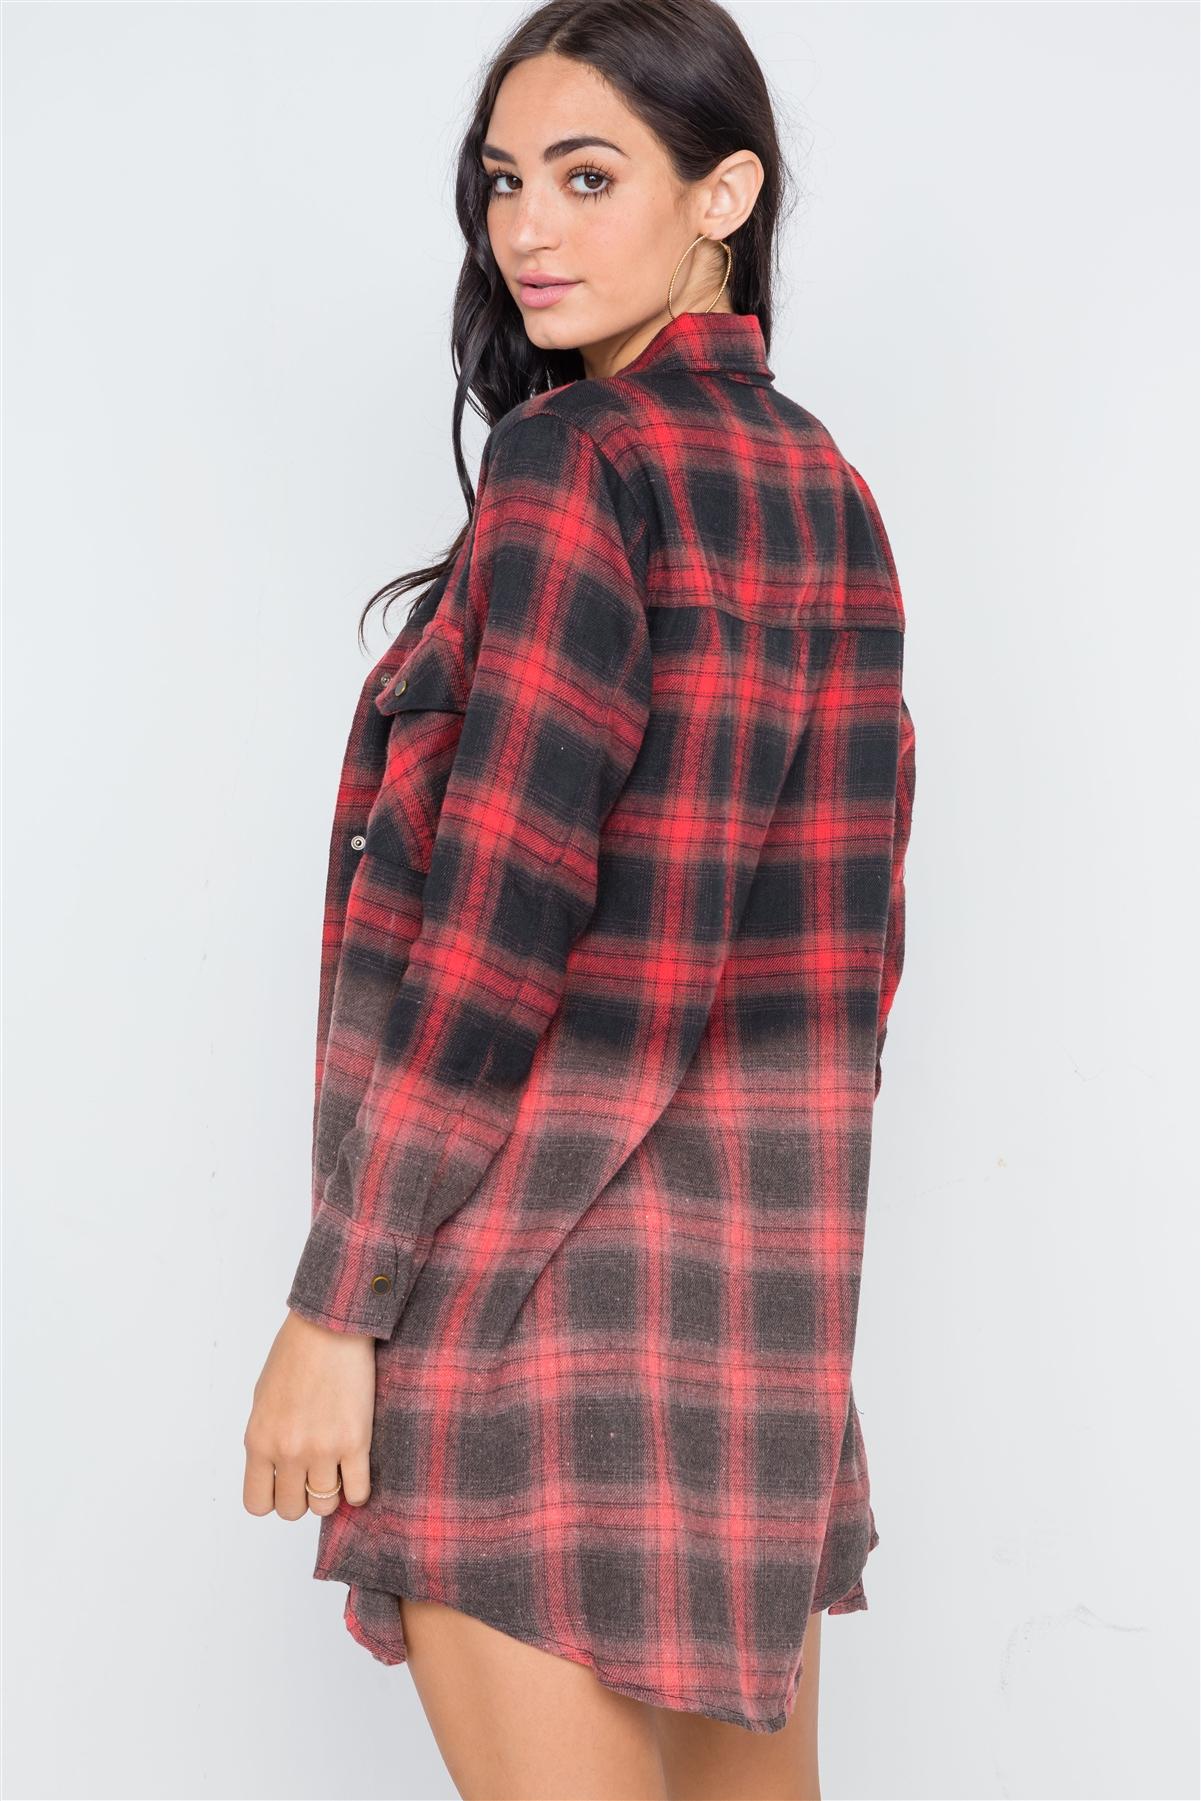 aab08ef6aa Red Black Plaid Flannel Long Sleeve Shirt Dress  4-2